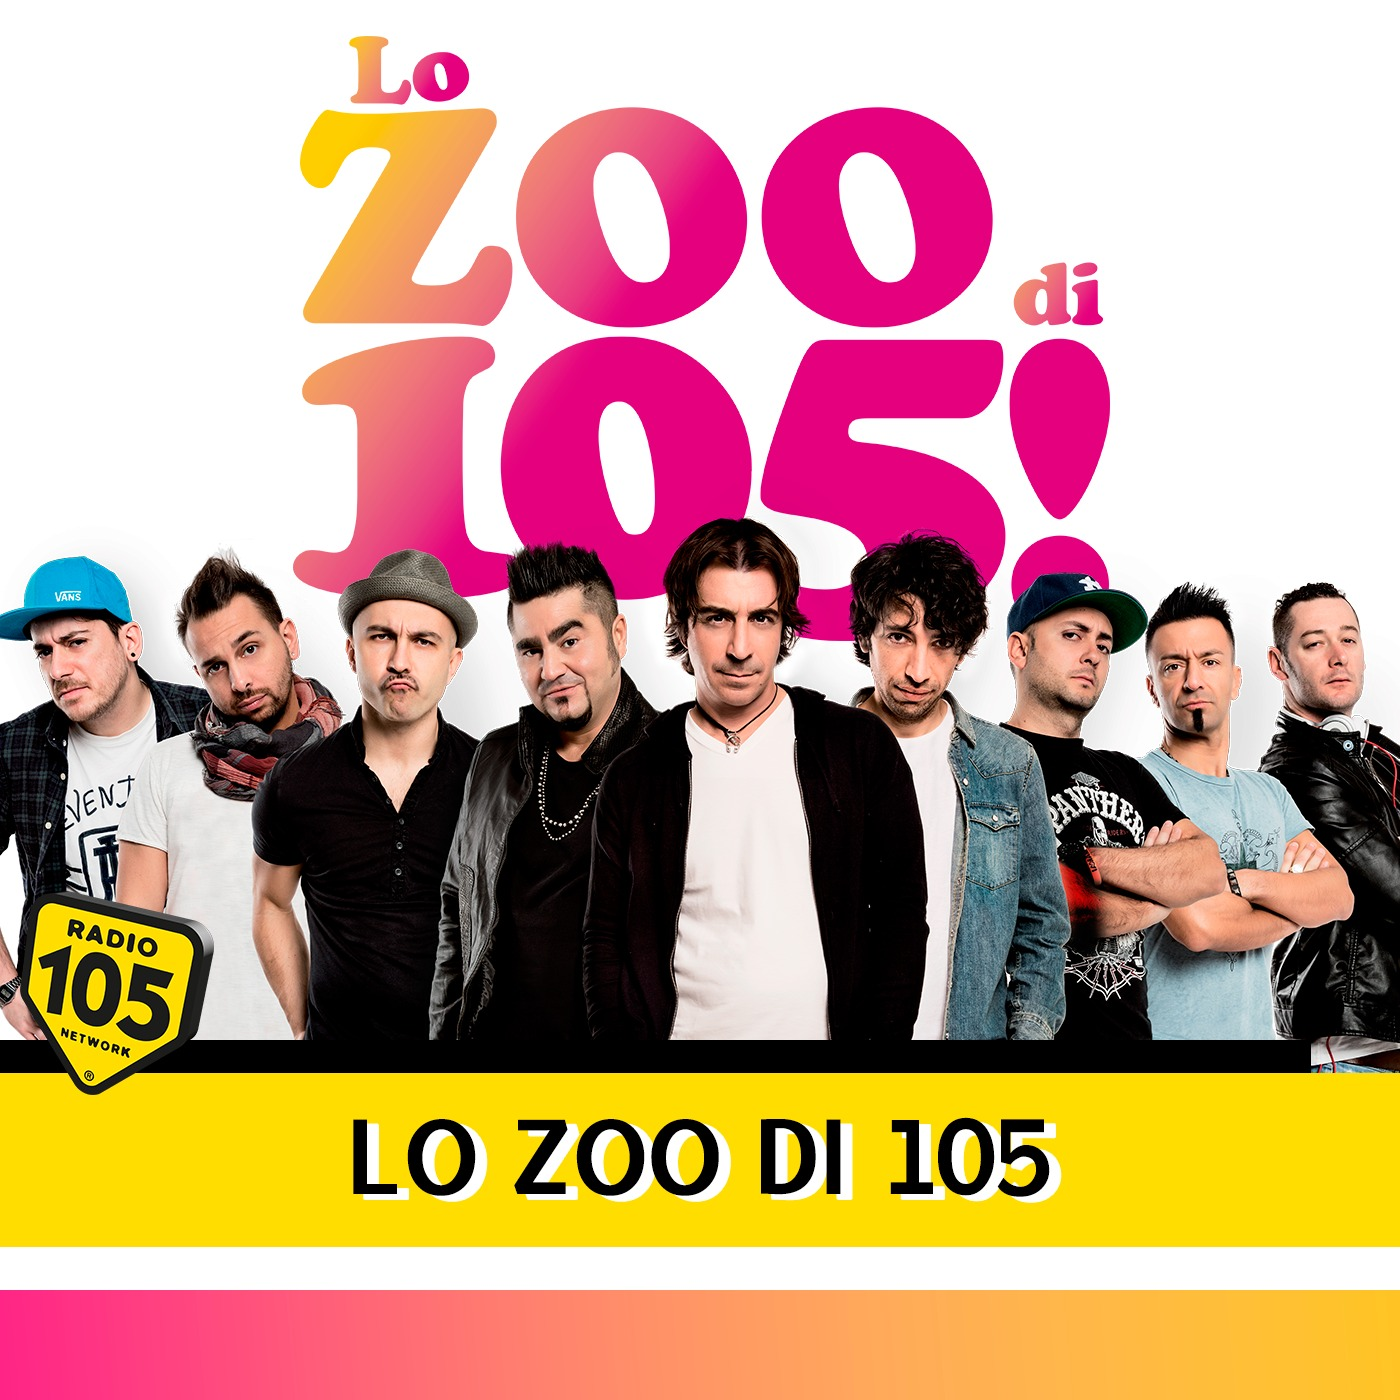 podcast radio 105